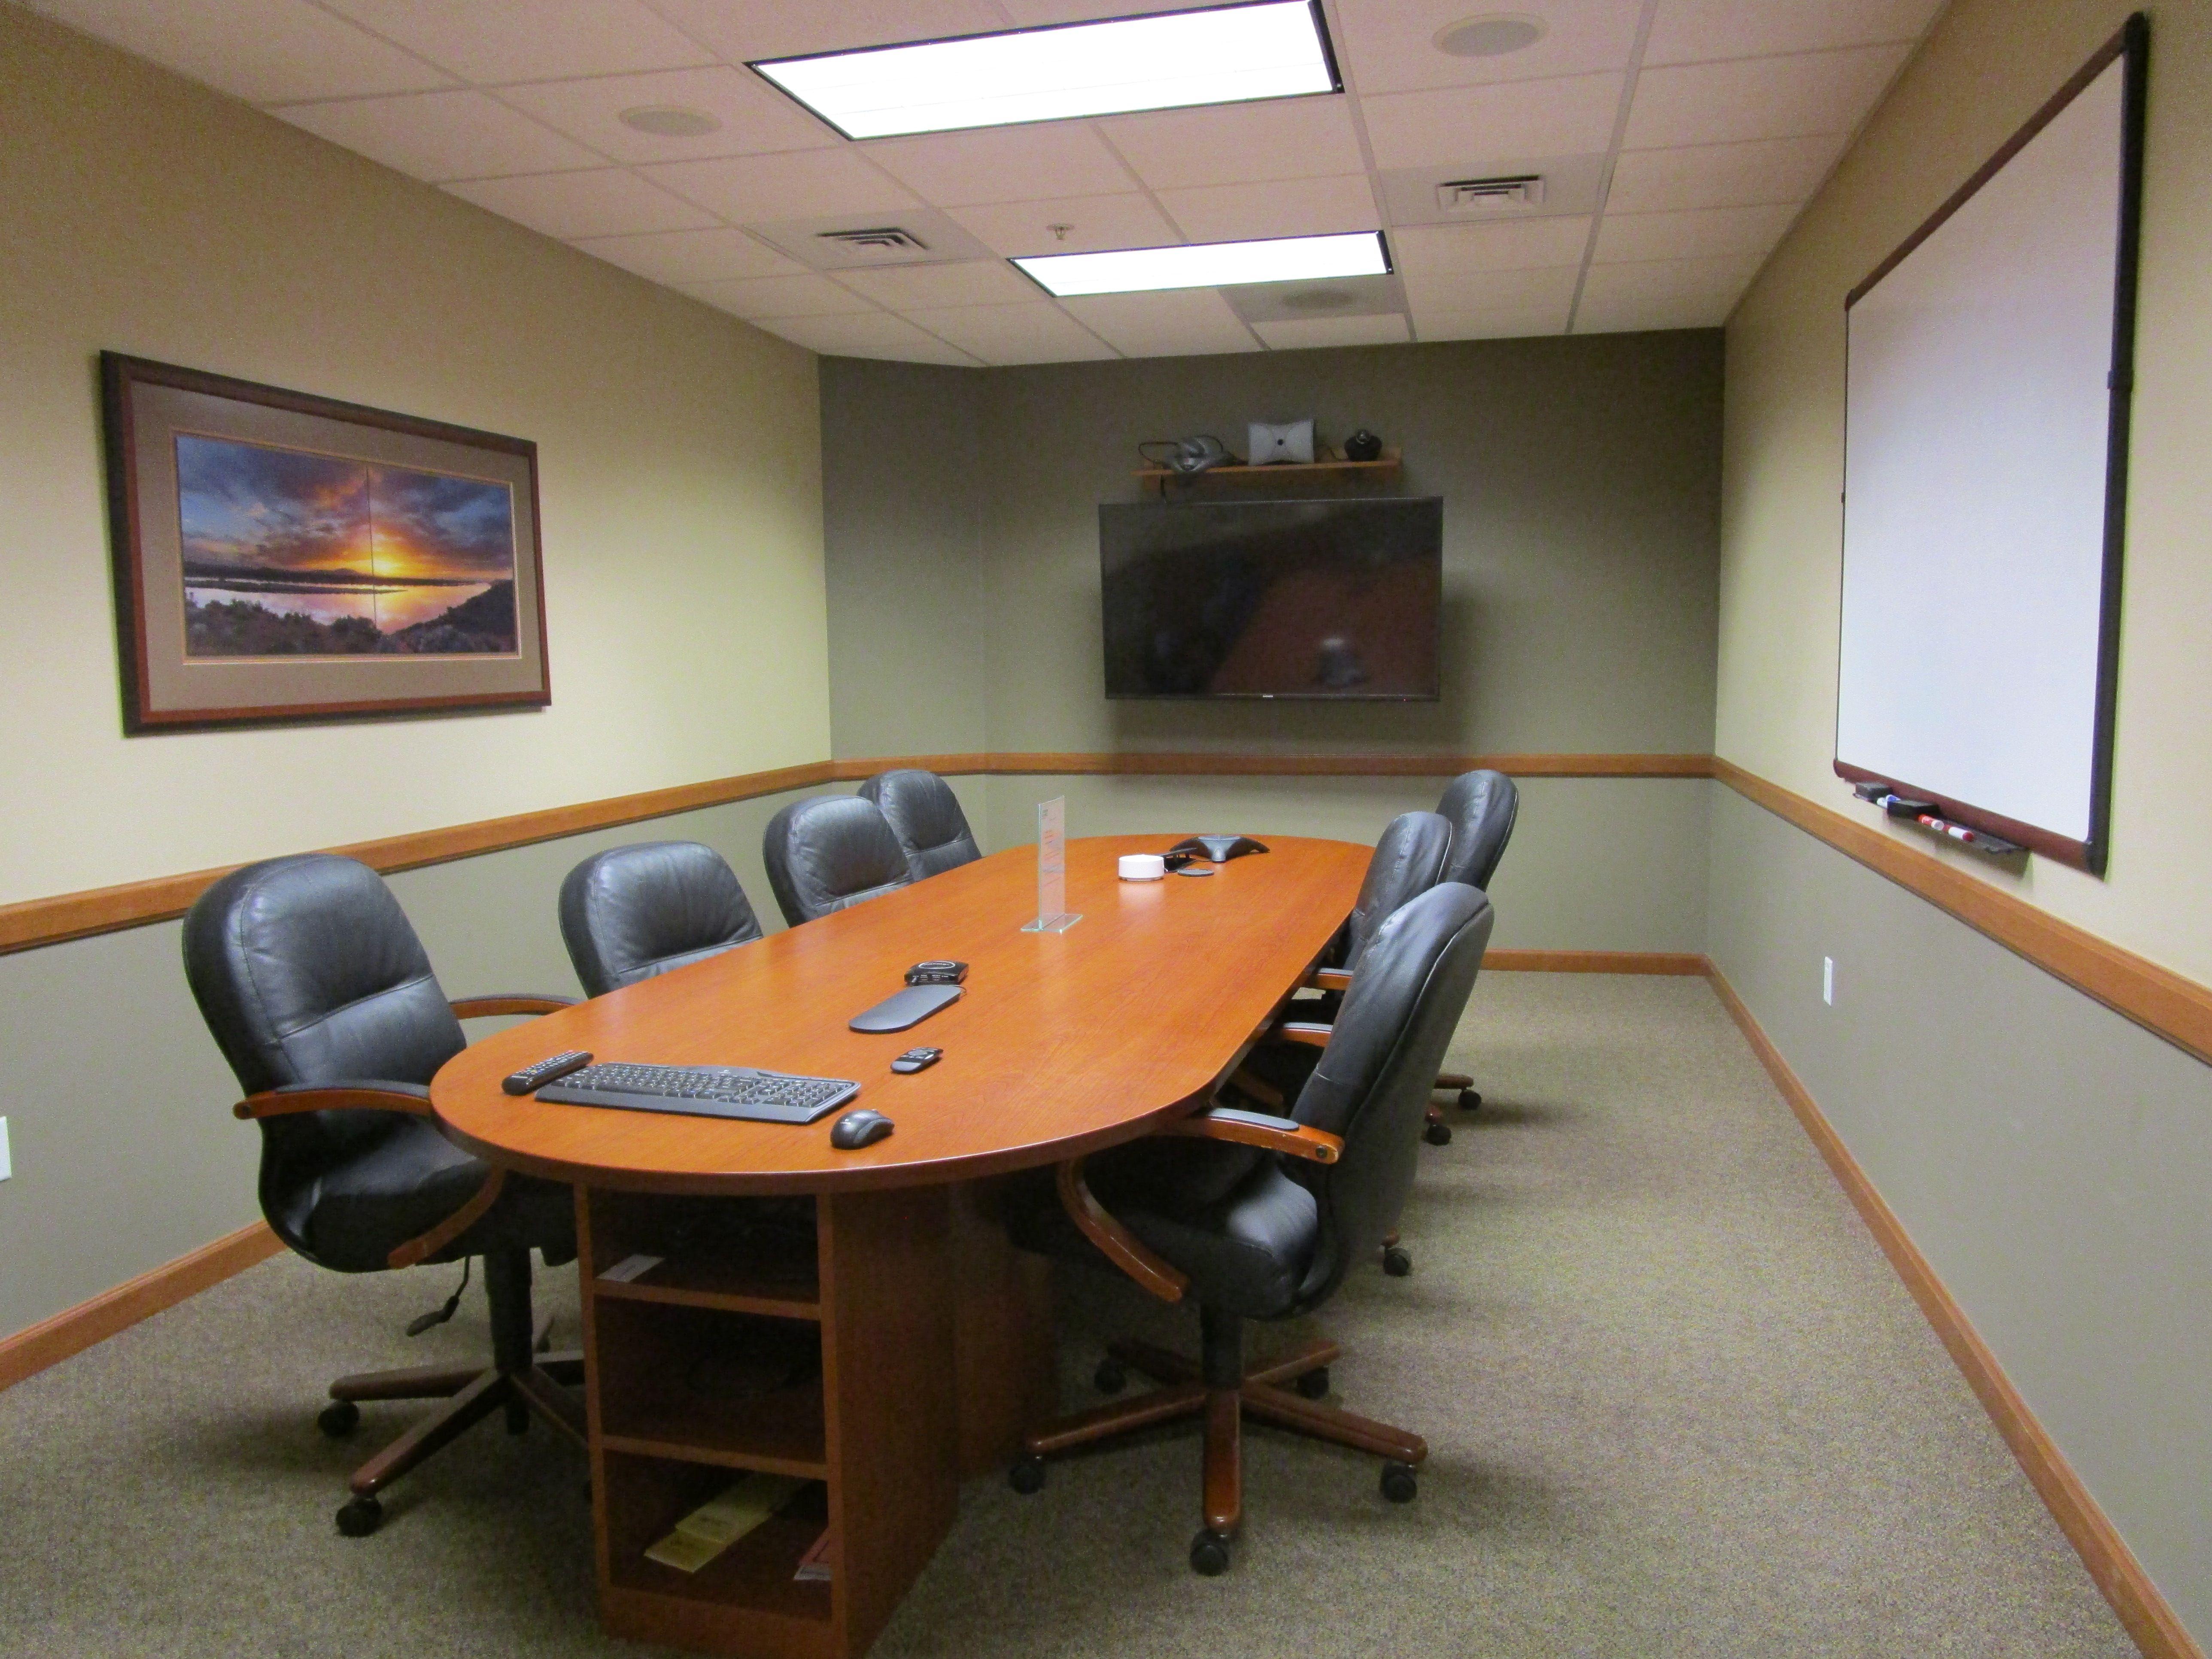 Real Estate Market Leaders Conference Room 1 Real Estate Marketing Home Decor Real Estate